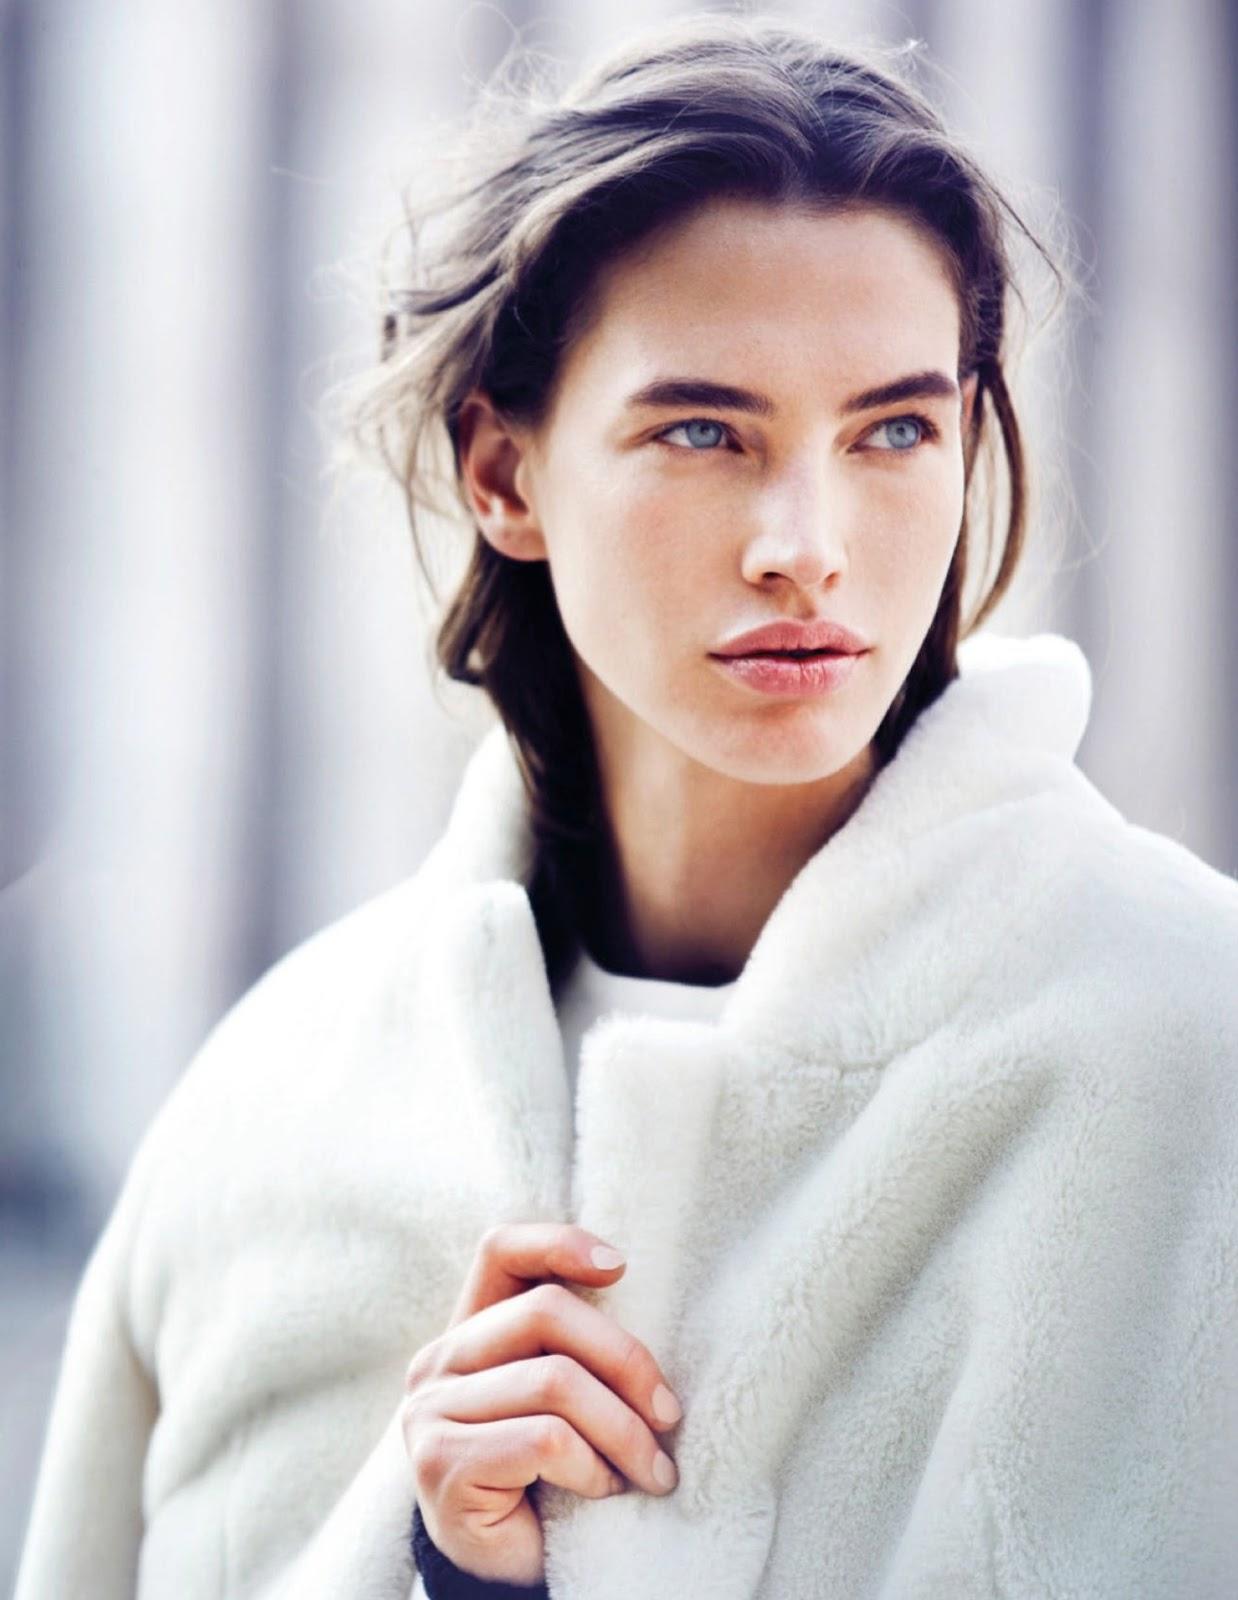 Vogue Thailand September 2013 (photography: Marcin Tyzka, styling: Ekaterina Mukhina, model: Crista Cober)